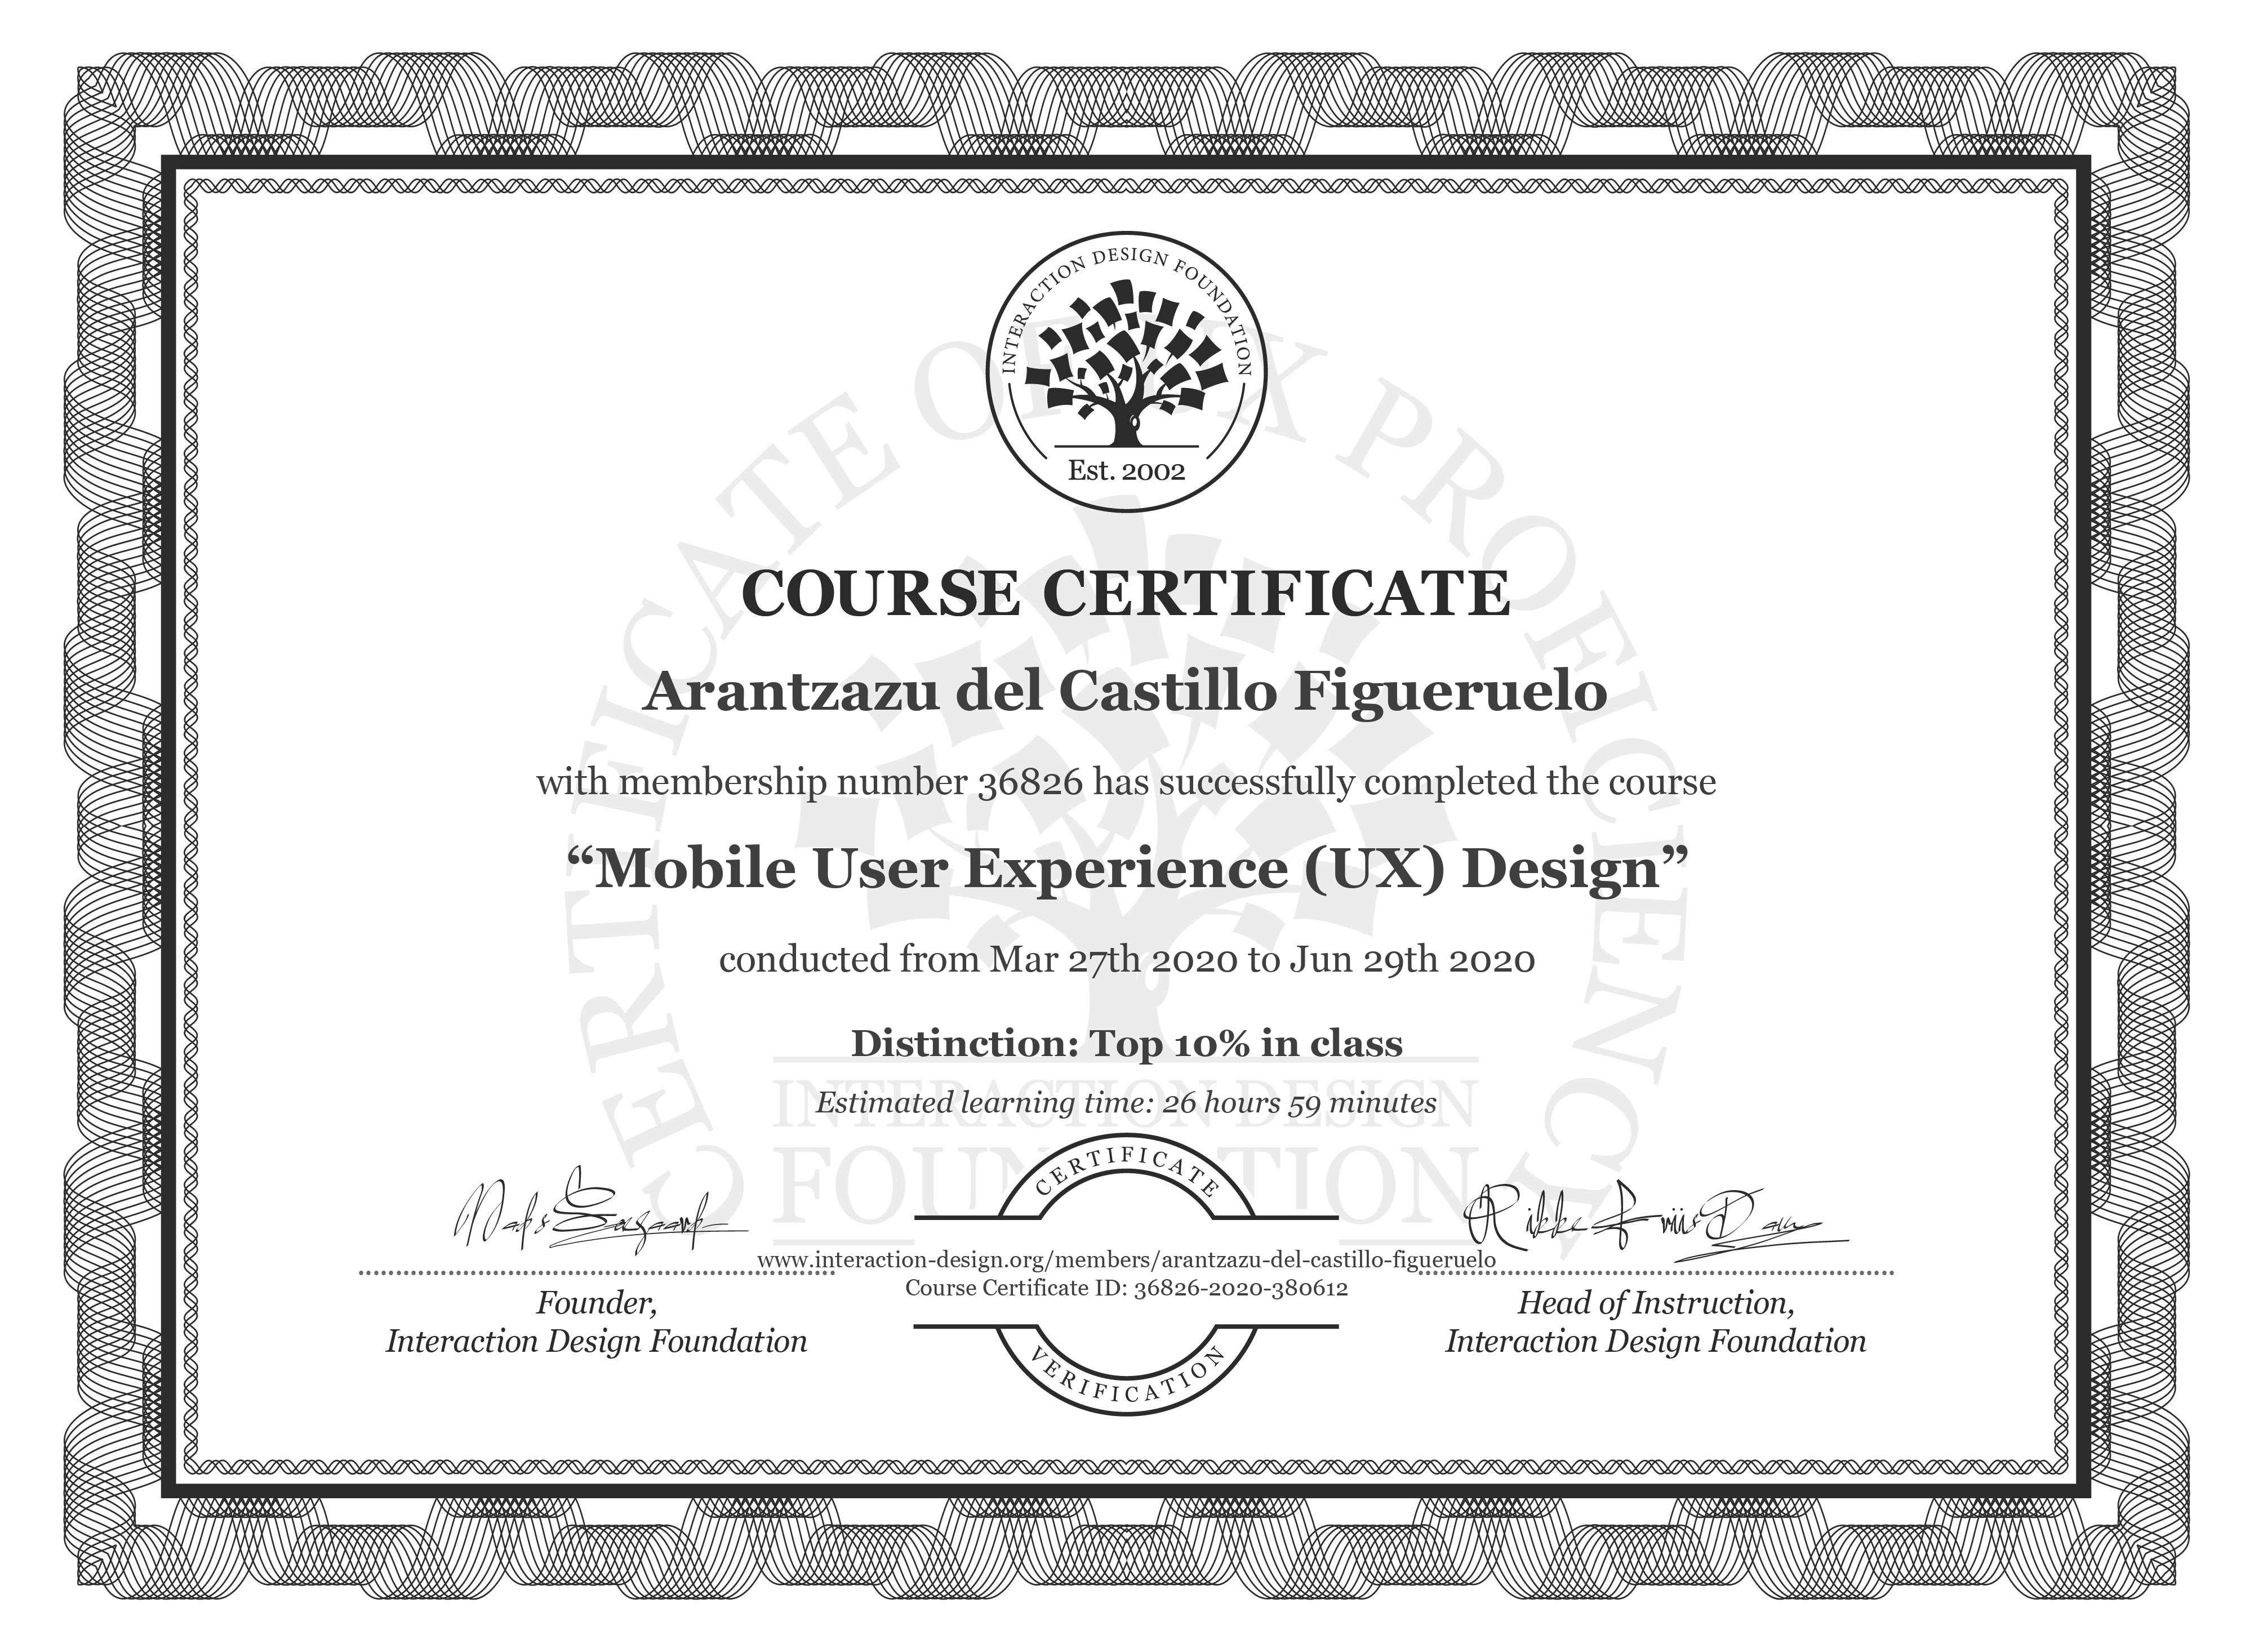 Arantzazu del Castillo Figueruelo's Course Certificate: Mobile User Experience (UX) Design